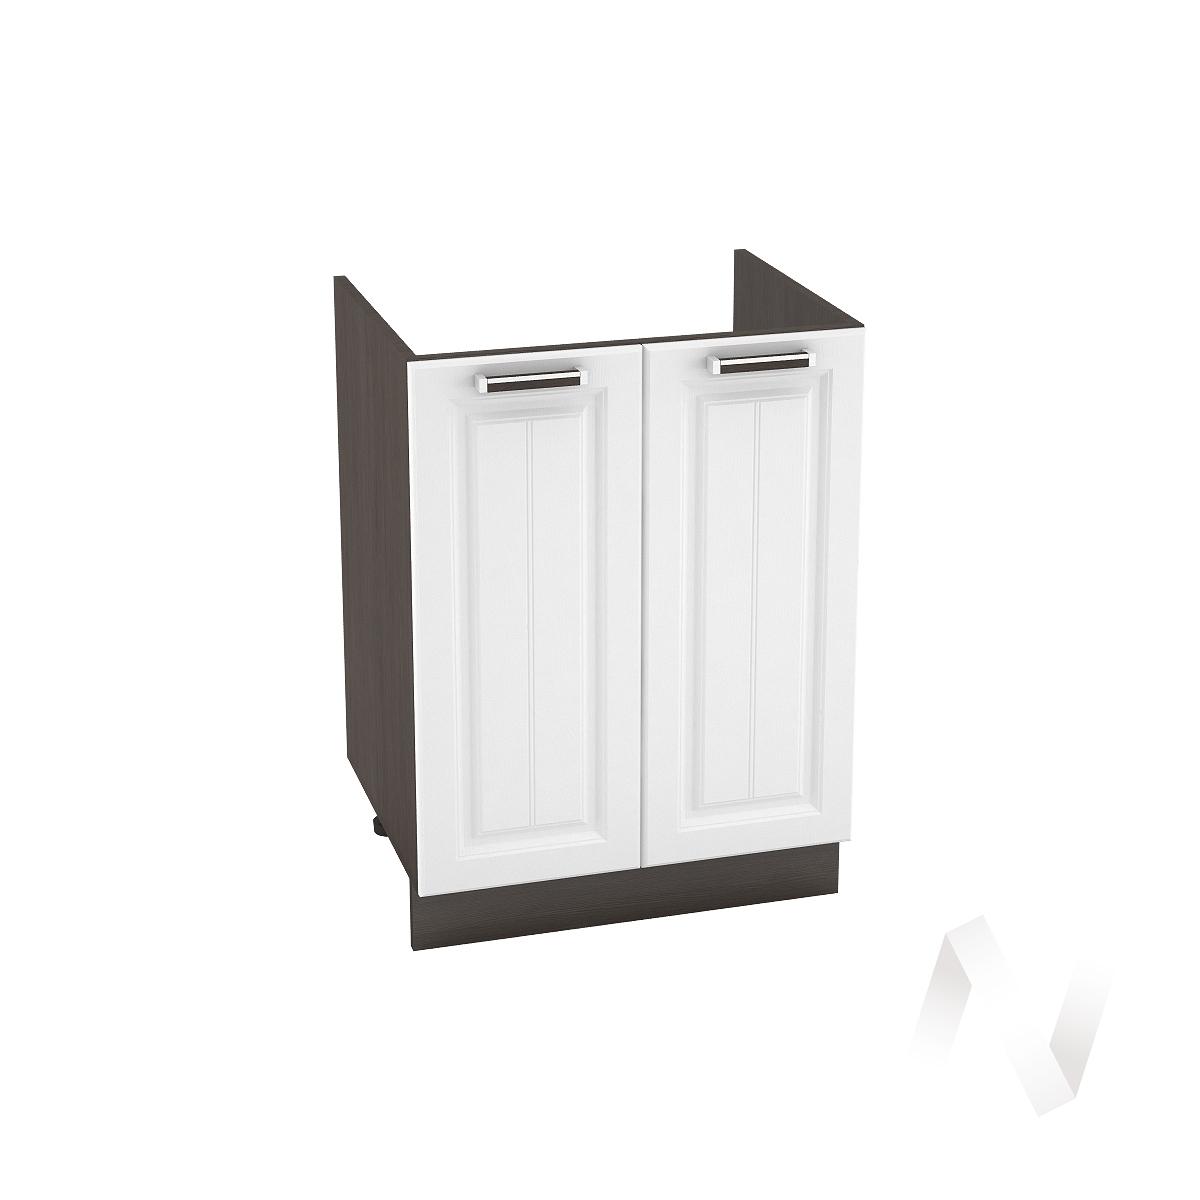 "Кухня ""Прага"": Шкаф нижний под мойку 600, ШНМ 600 (белое дерево/корпус венге)"